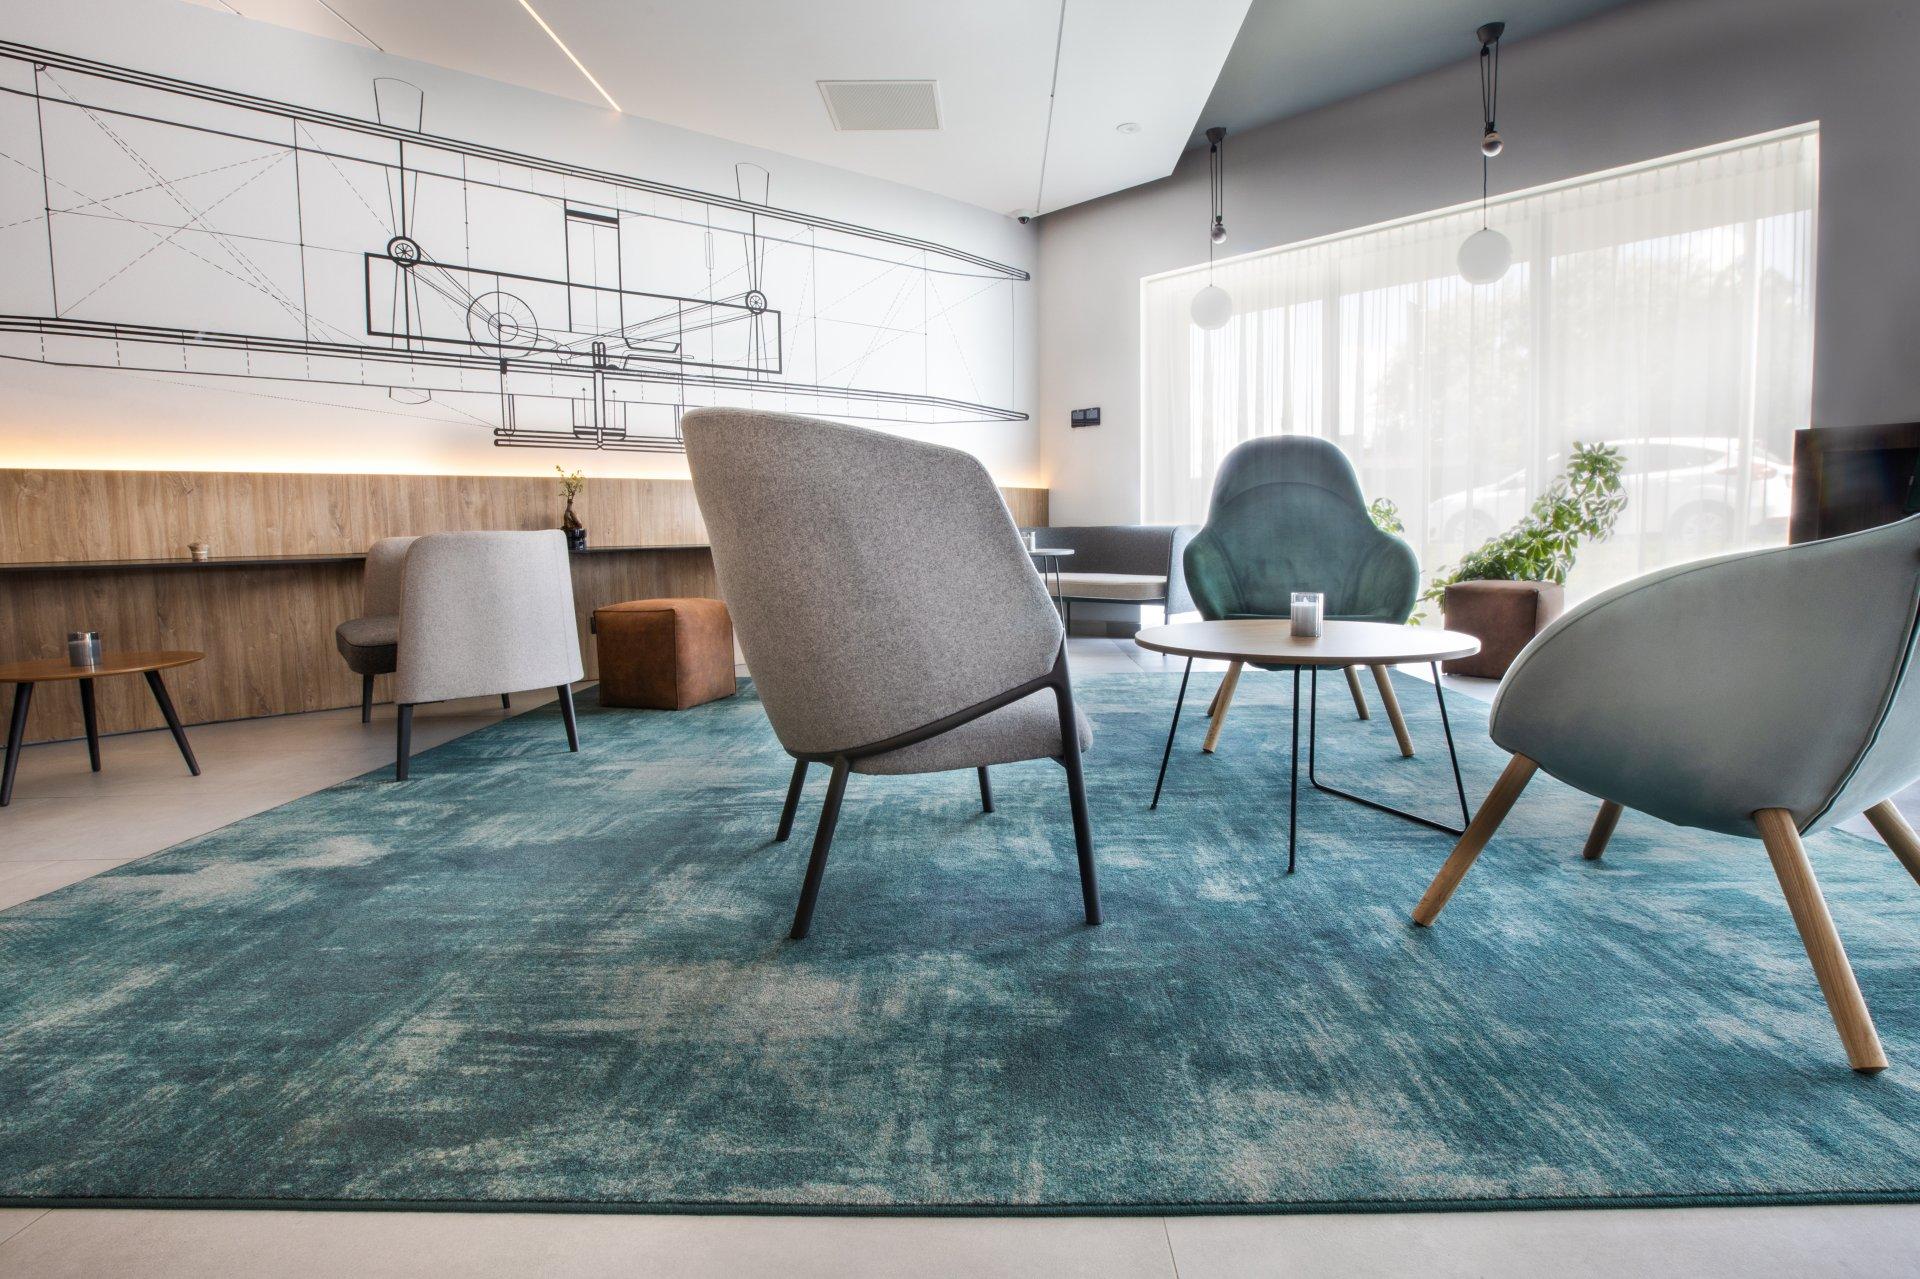 20200625-carpet-and-more-hilton-otopeni-20